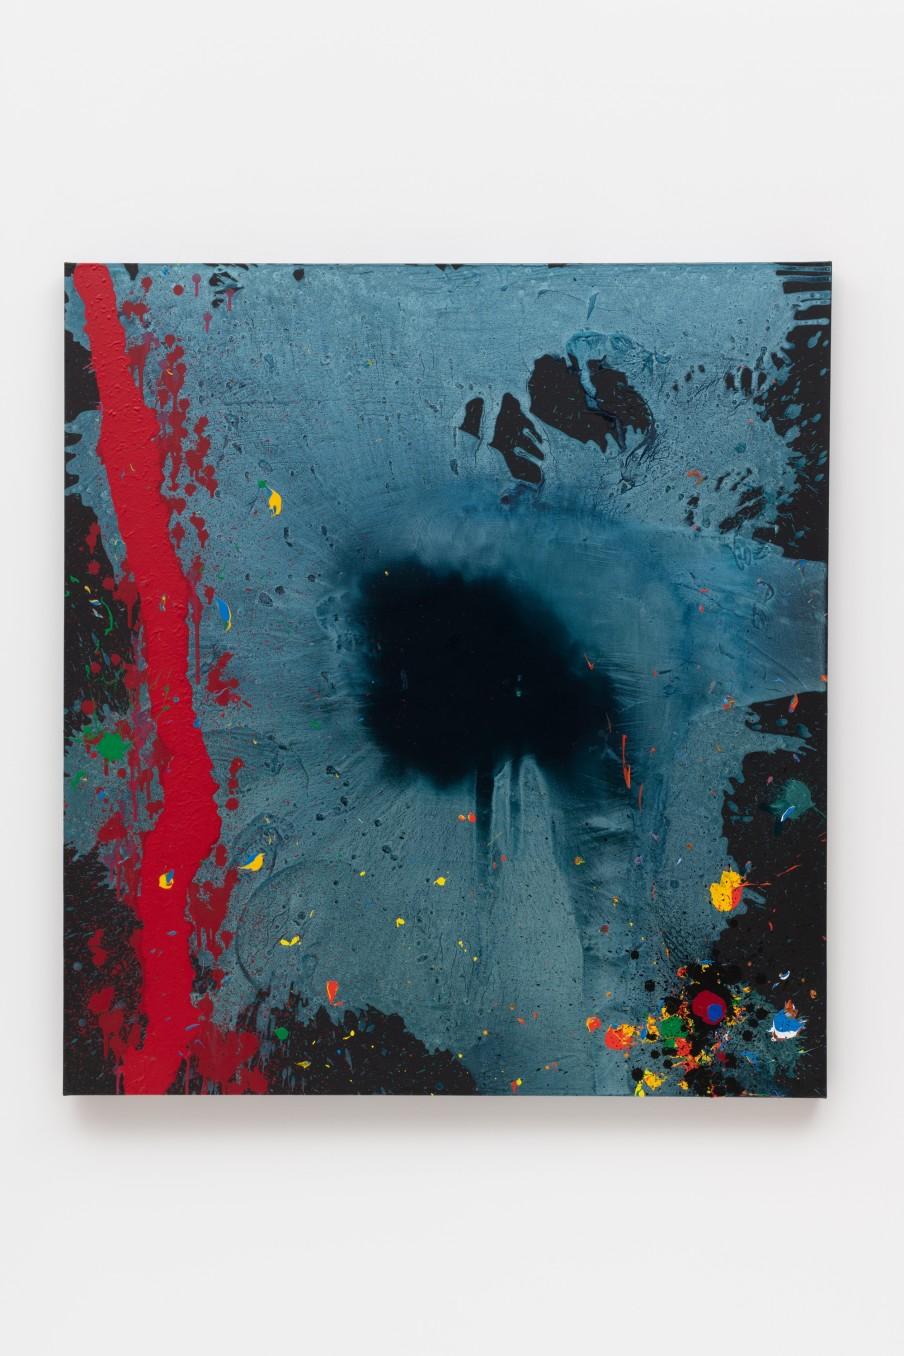 John Hoyland Lost 7.2.10, 2010 Acrylic on canvas 152.7 x 139.8 cm 60 1/8 x 55 1/8 in